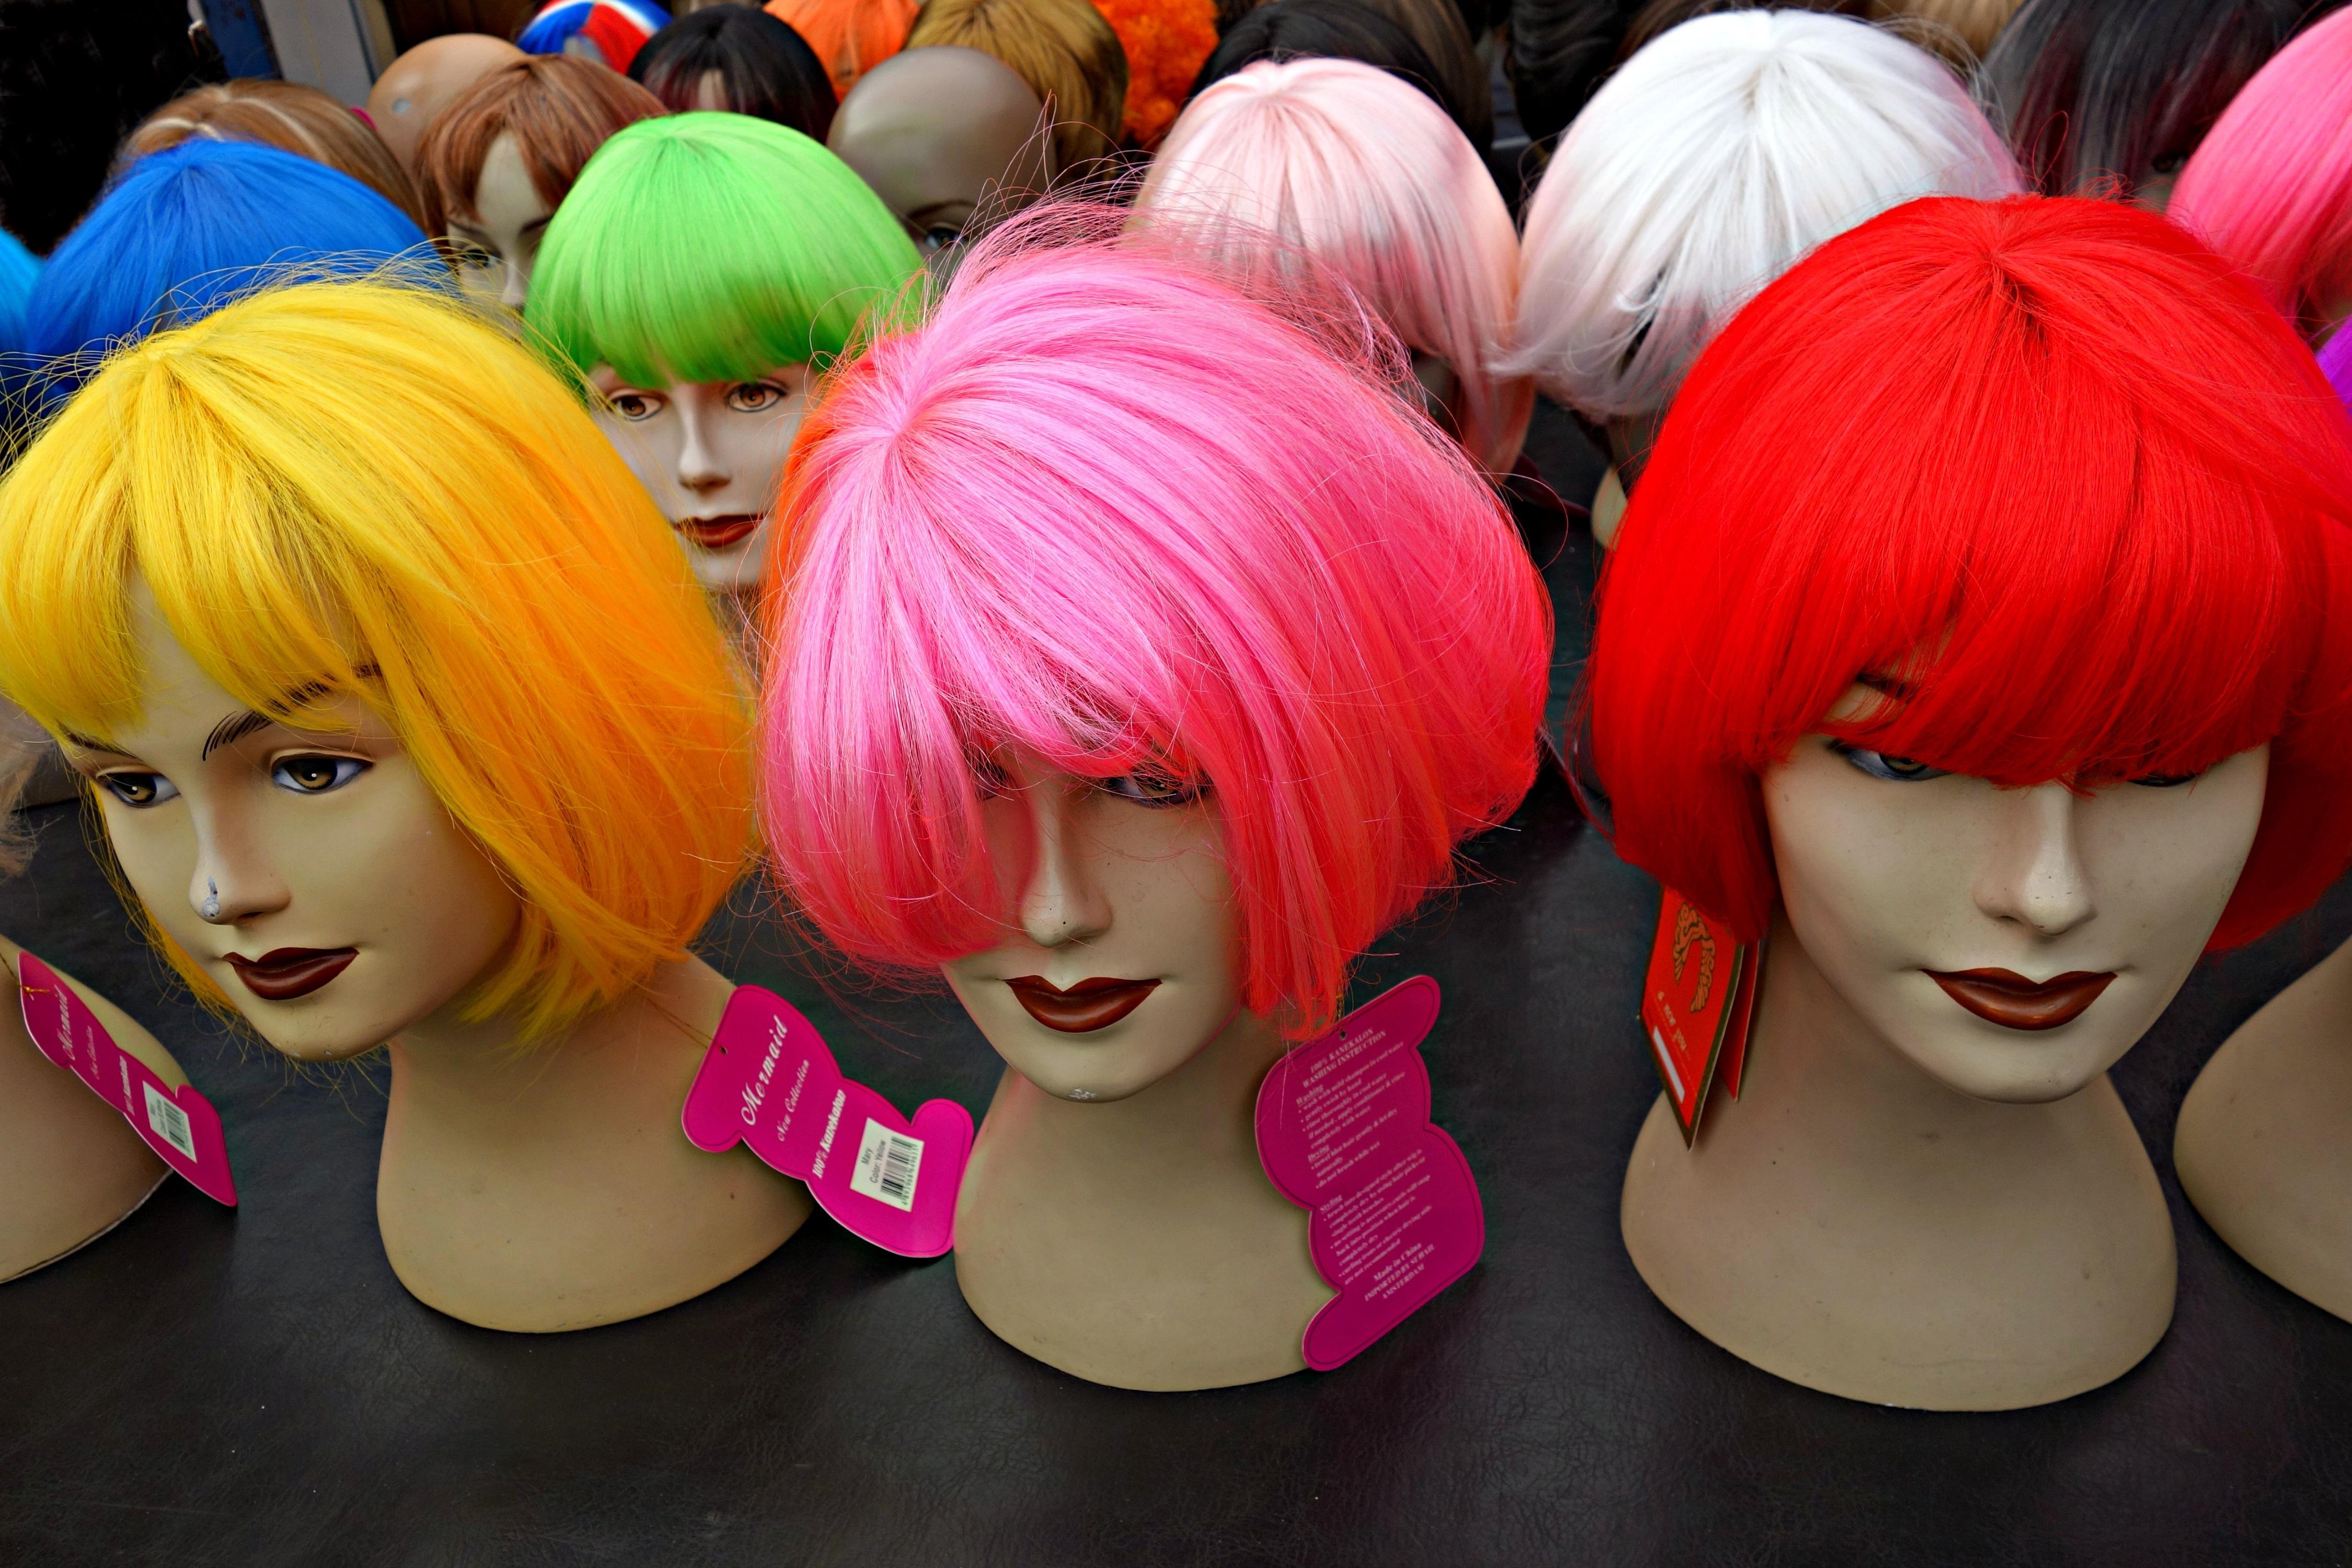 8160387eee cabello rojo color Moda mercado ropa rosado peinado cabello rojo muñeca  mujer disfraz peluca Anime glamour